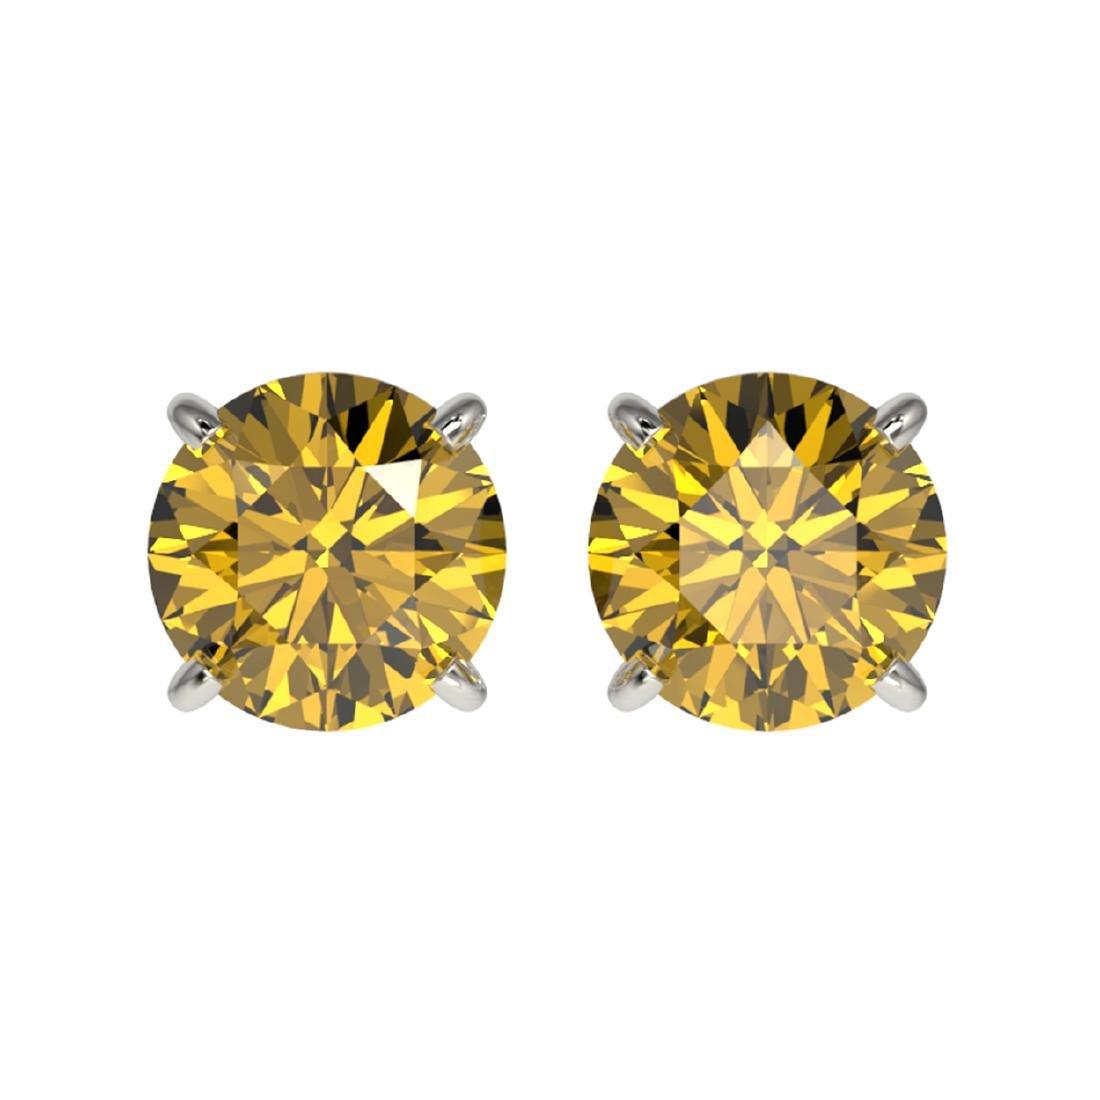 1.50 ctw Intense Yellow Diamond Stud Earrings 10K White